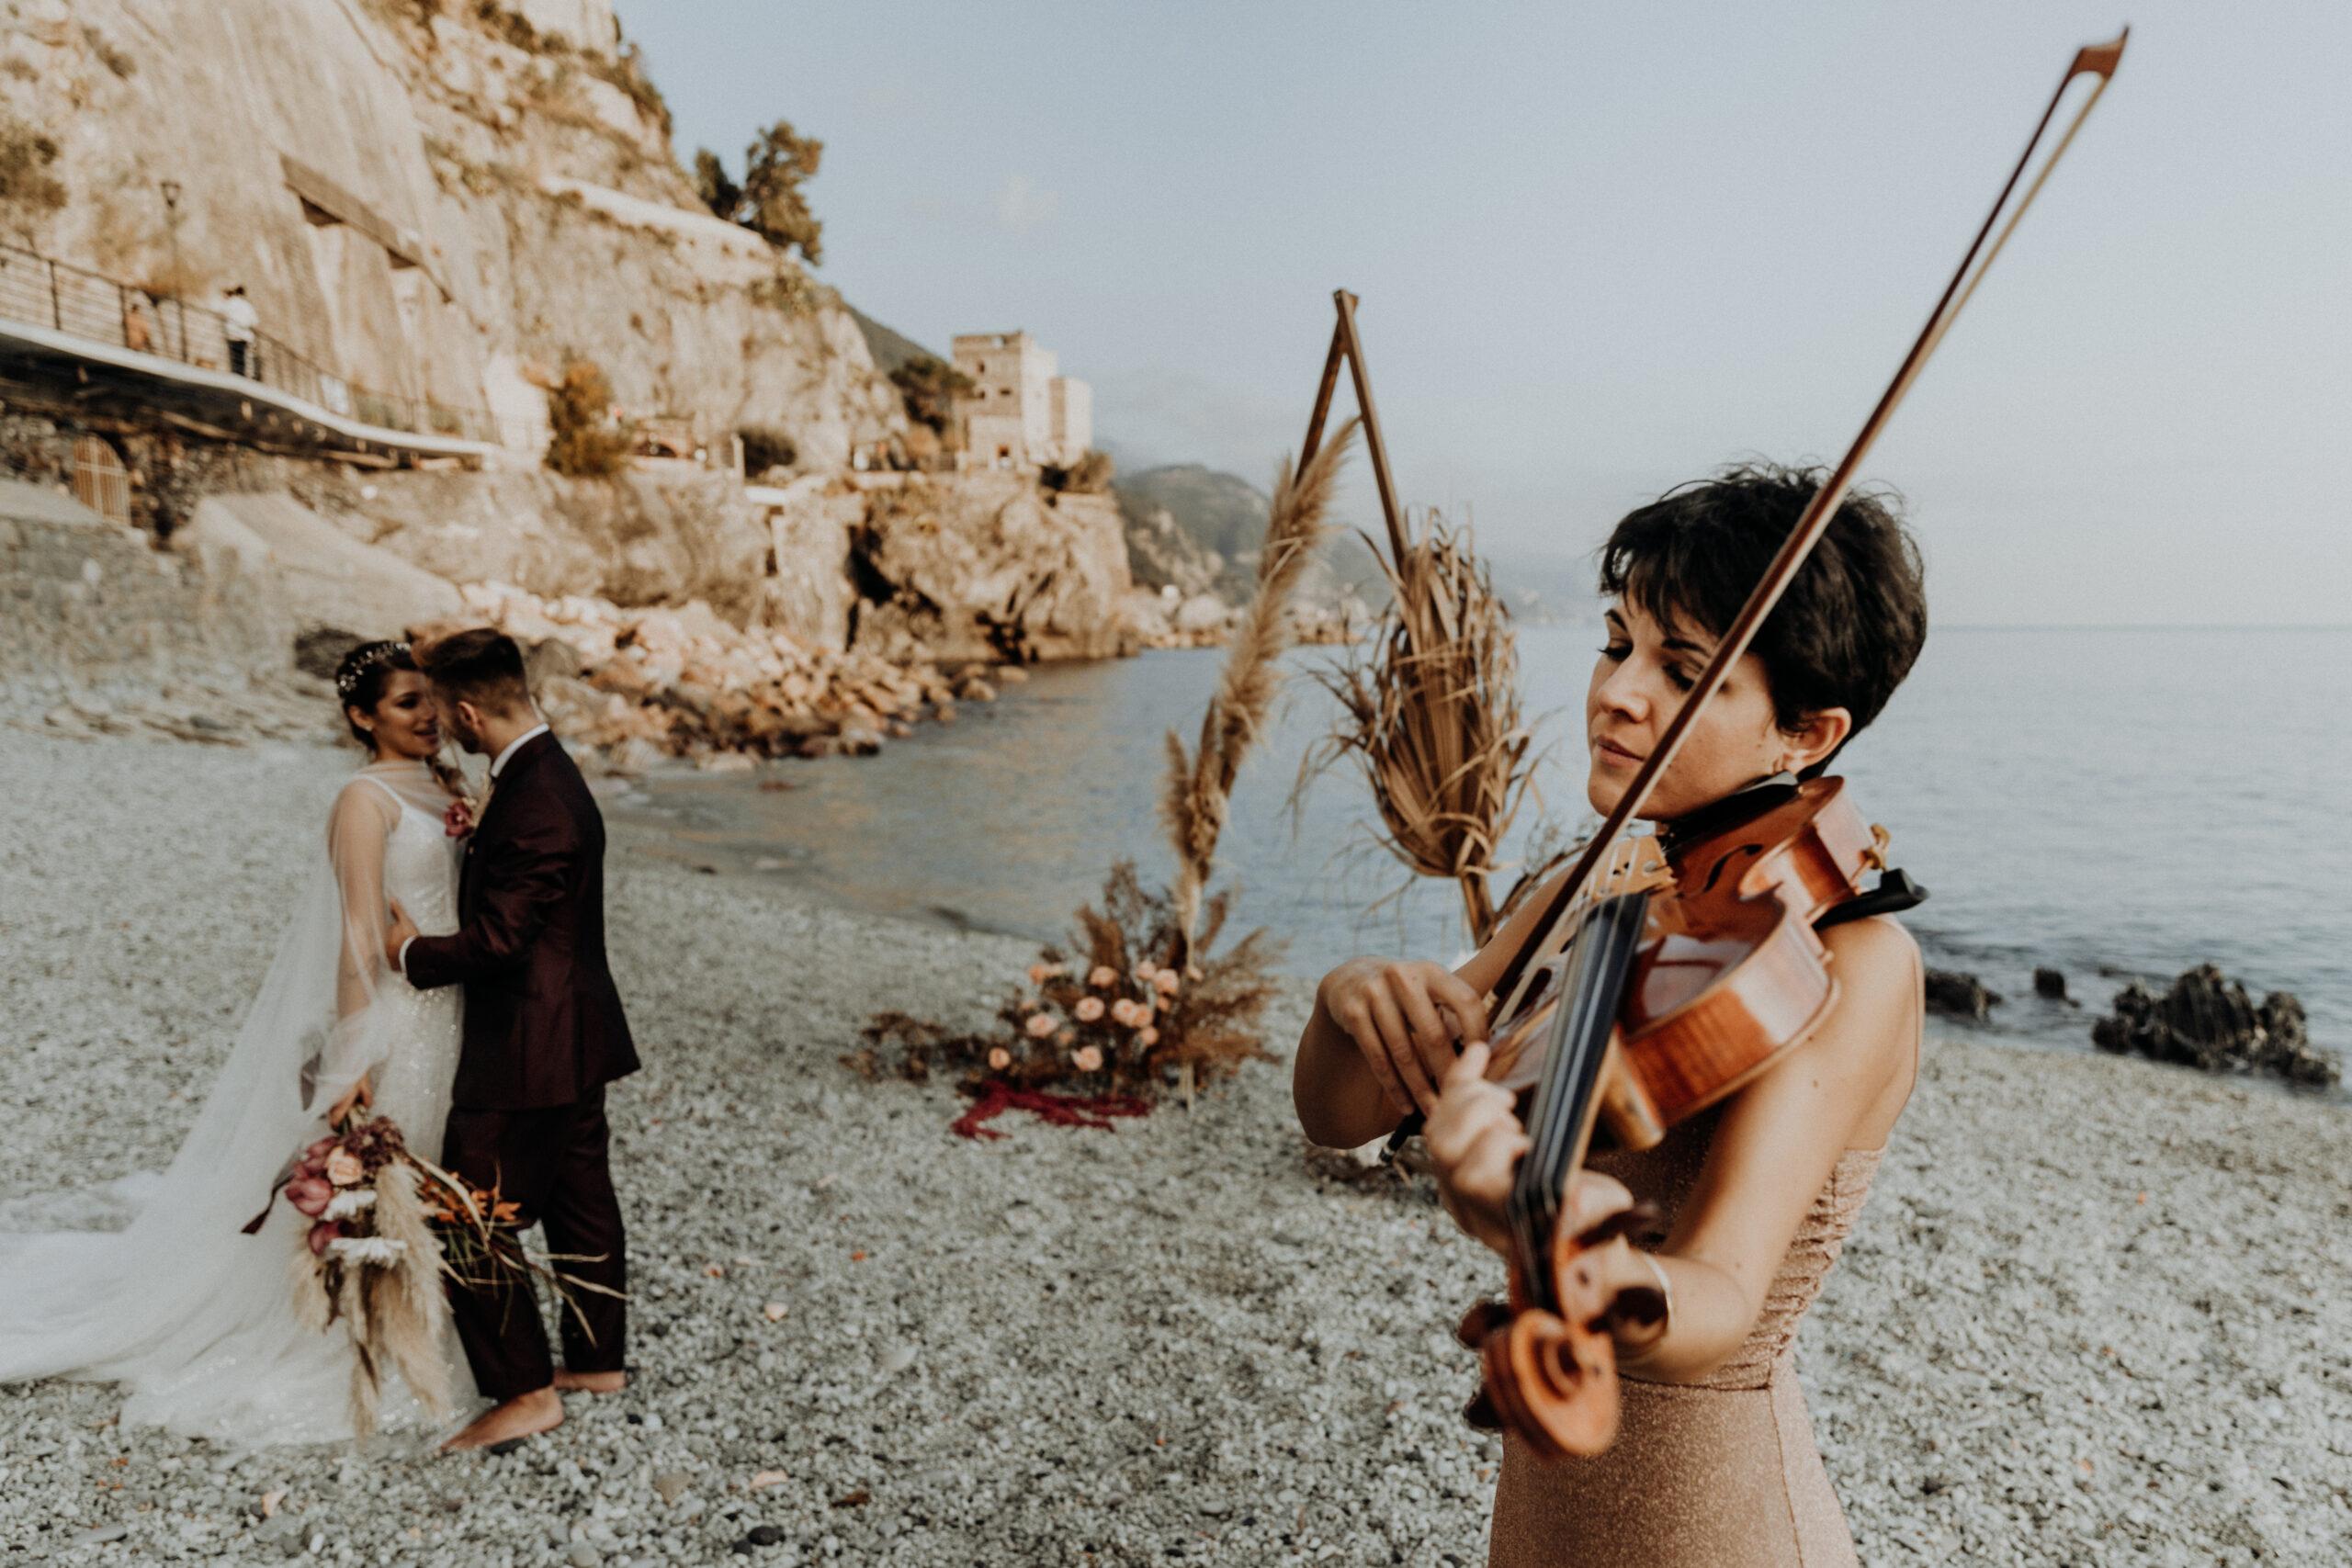 A. Vulcano, WEDDING SHOOTING - WP. S. Vicale - (MONTEROSSO AL MARE)